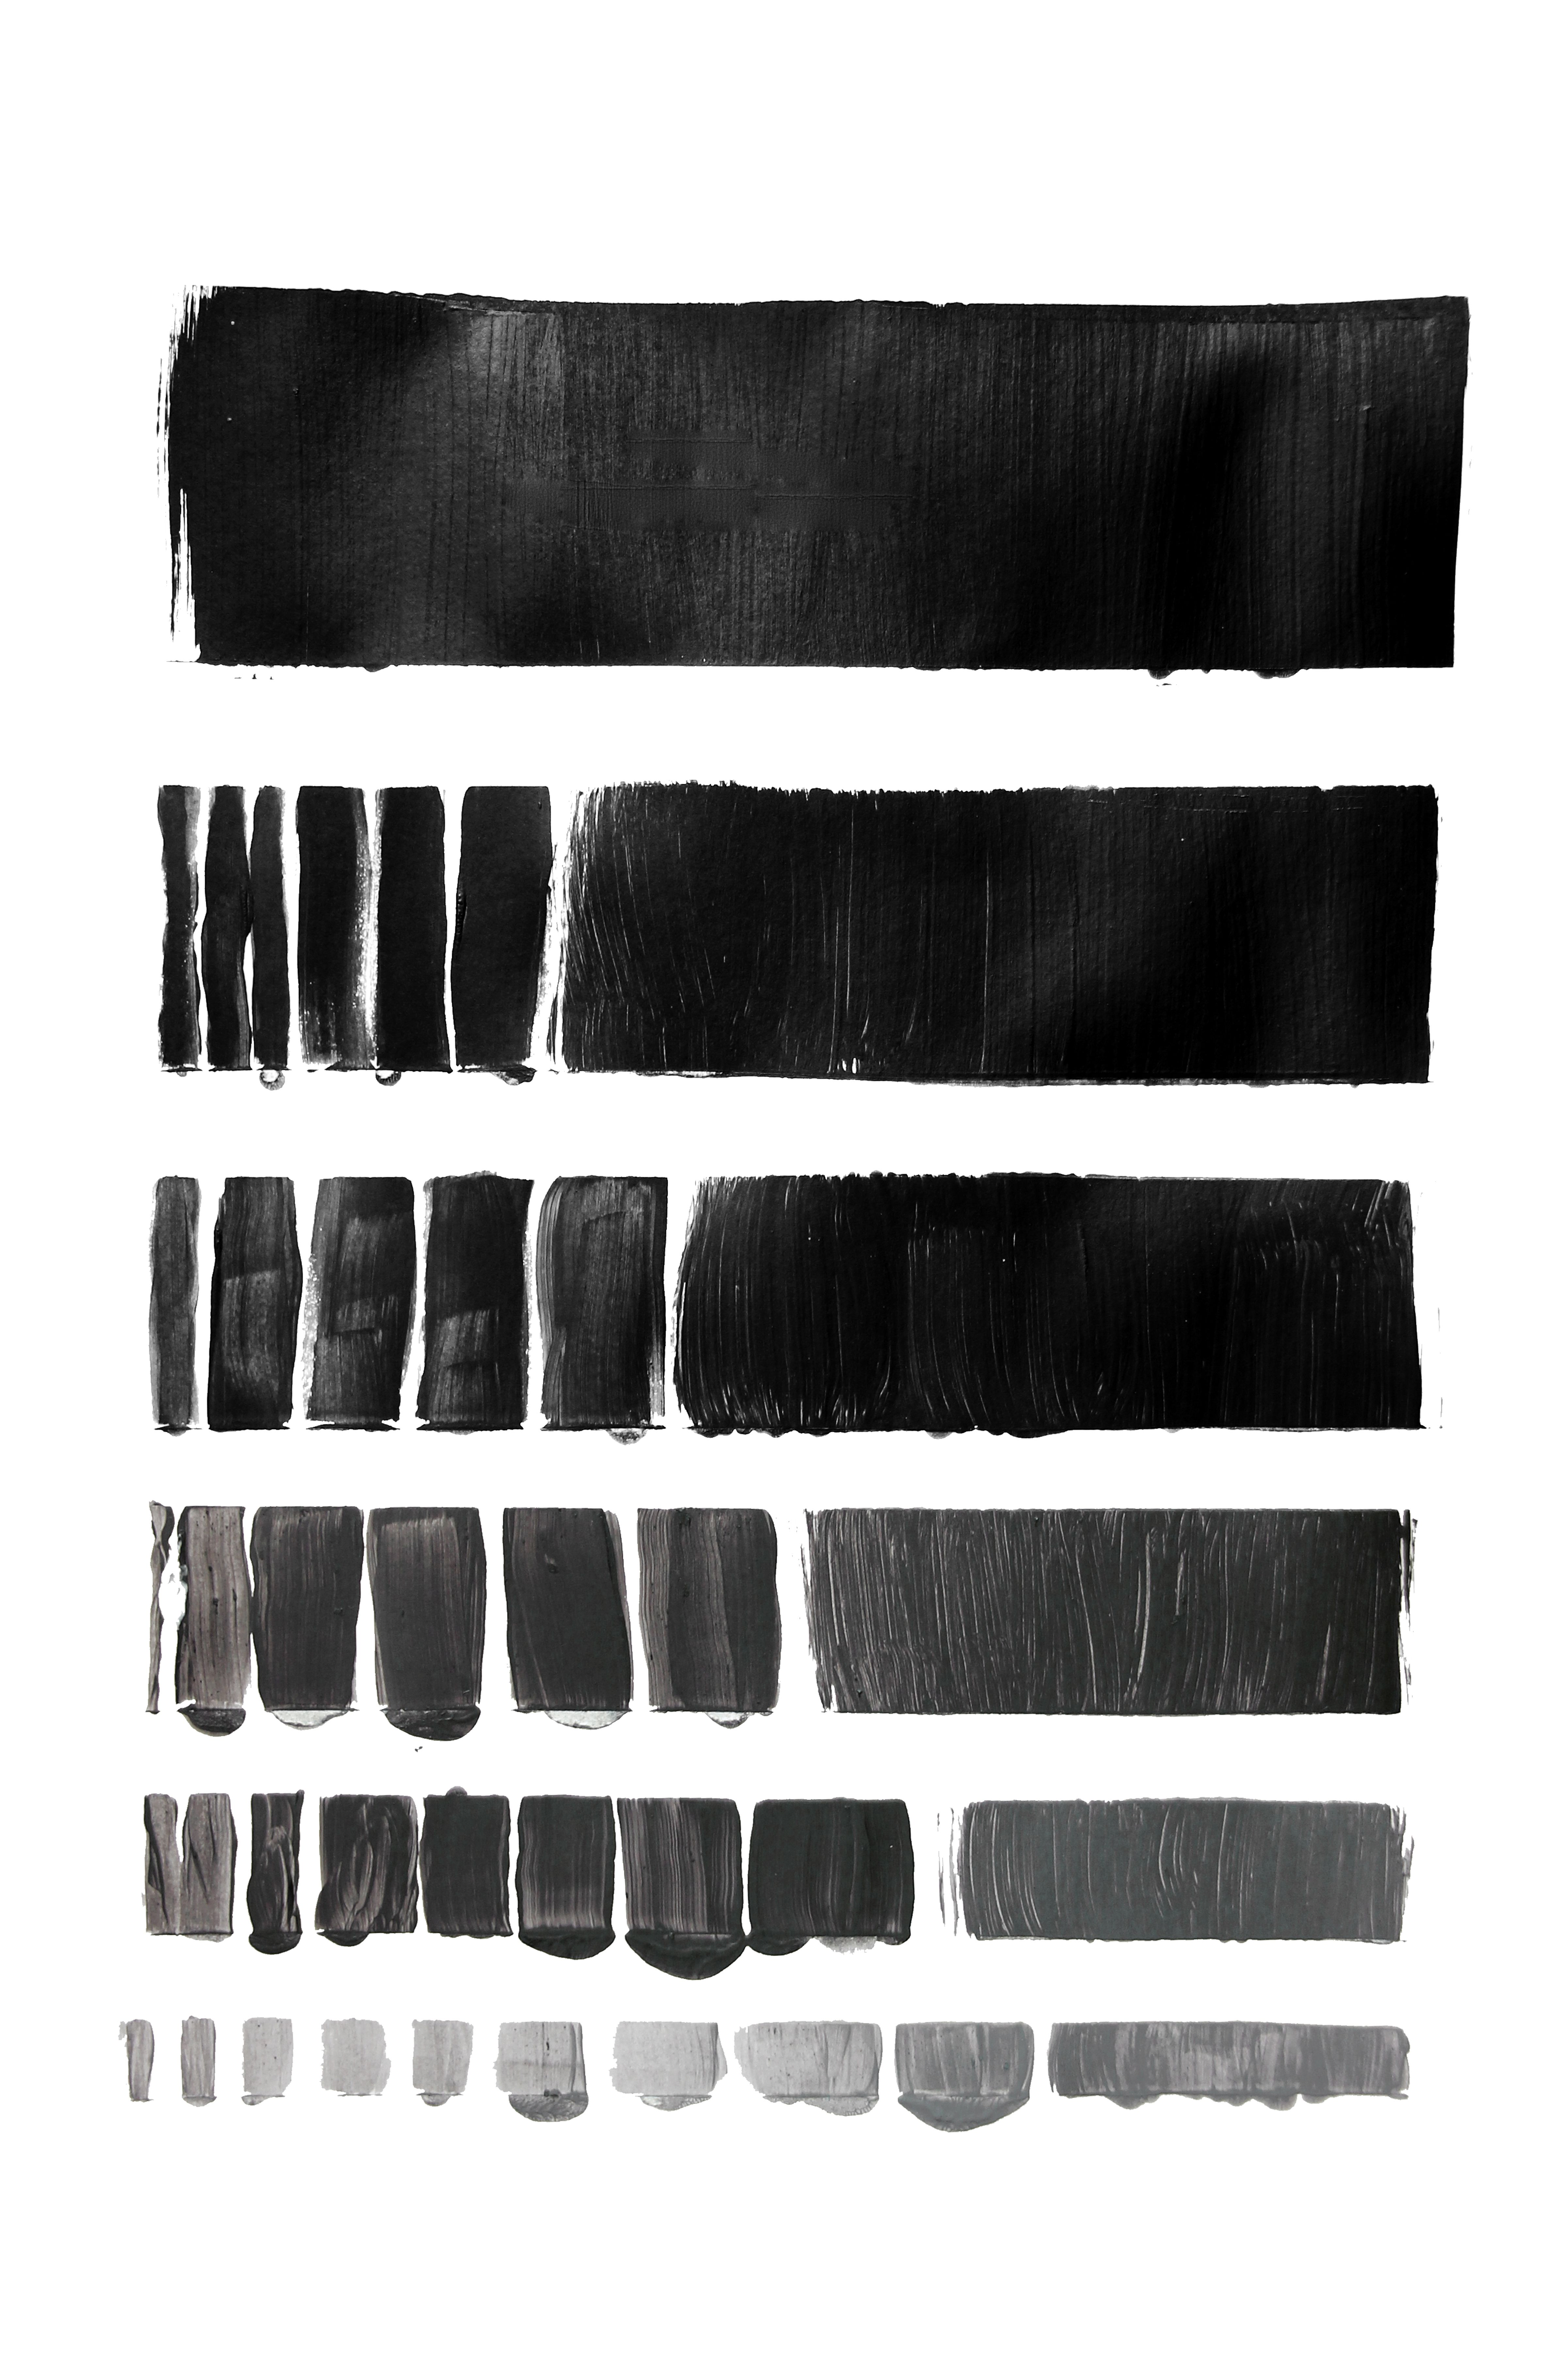 Black Grey Minimalist Poster Print Artprint Handmade Acrylic Paint Minimal Art Flowing Colors Unframed Downlo Minimalist Iphone Minimalist Art Wall Paper Phone